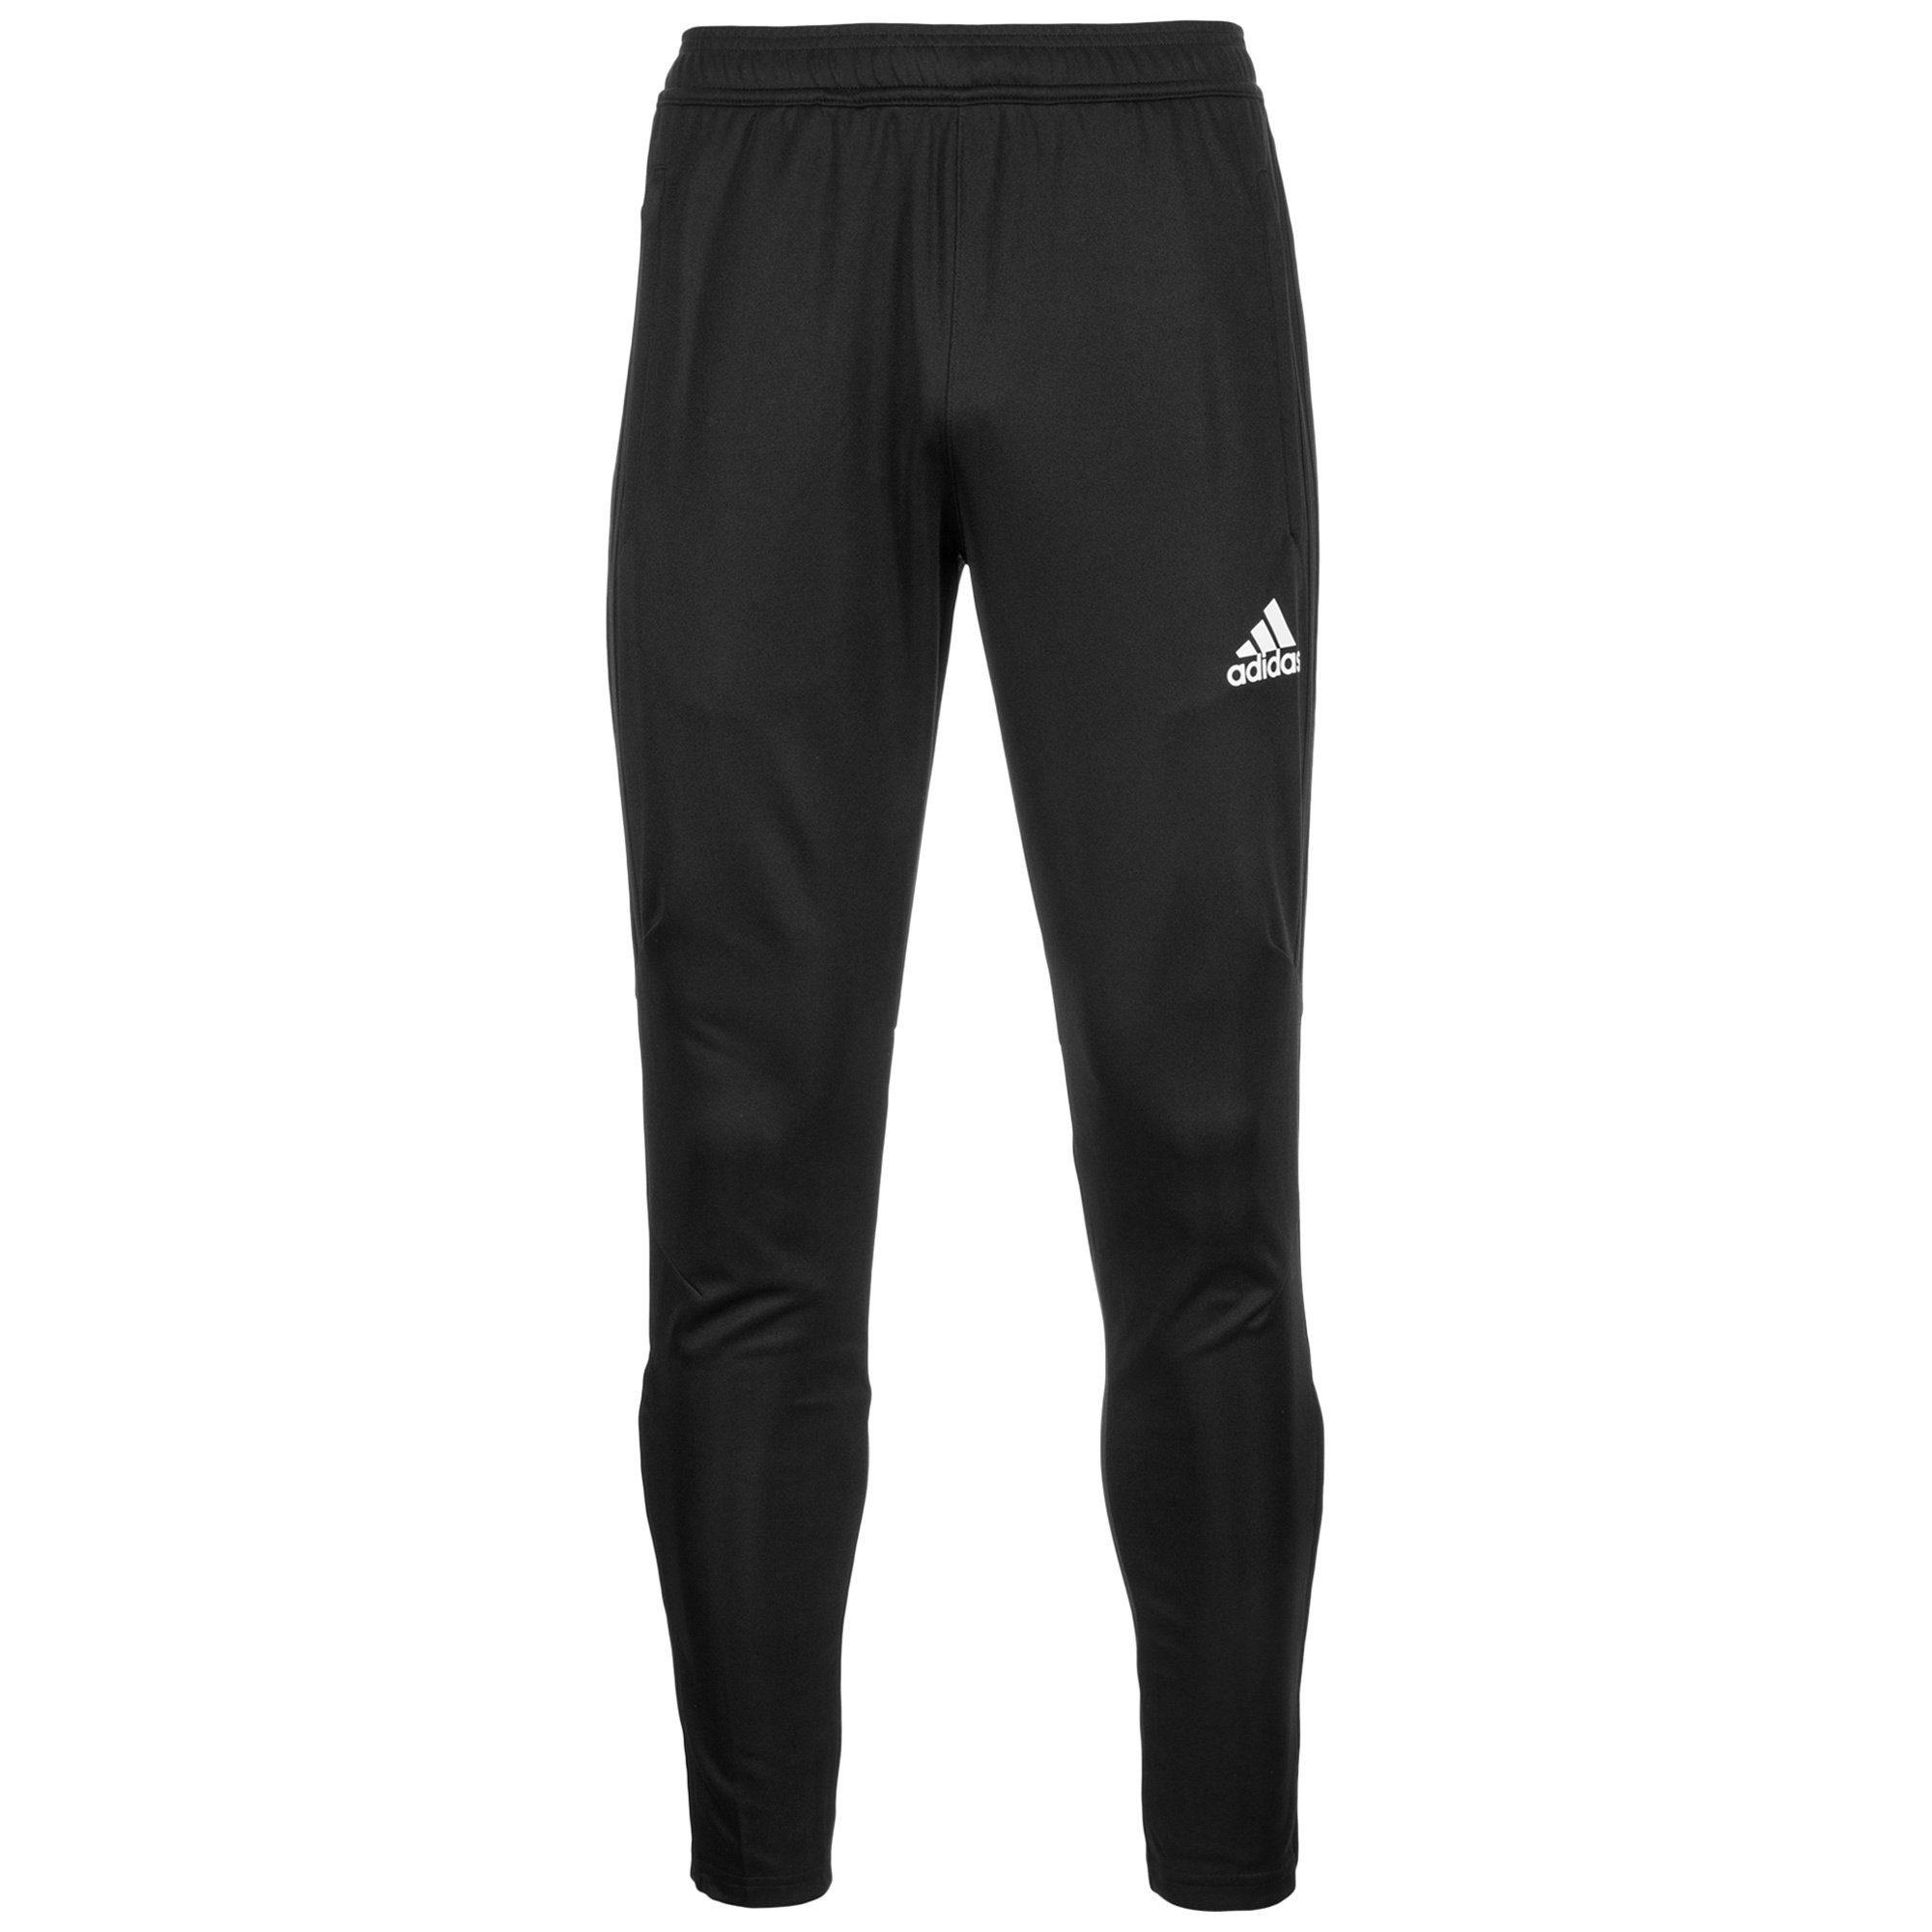 adidas Performance Trainingshose Tiro 17 | Sportbekleidung > Sporthosen | Schwarz | Adidas Performance